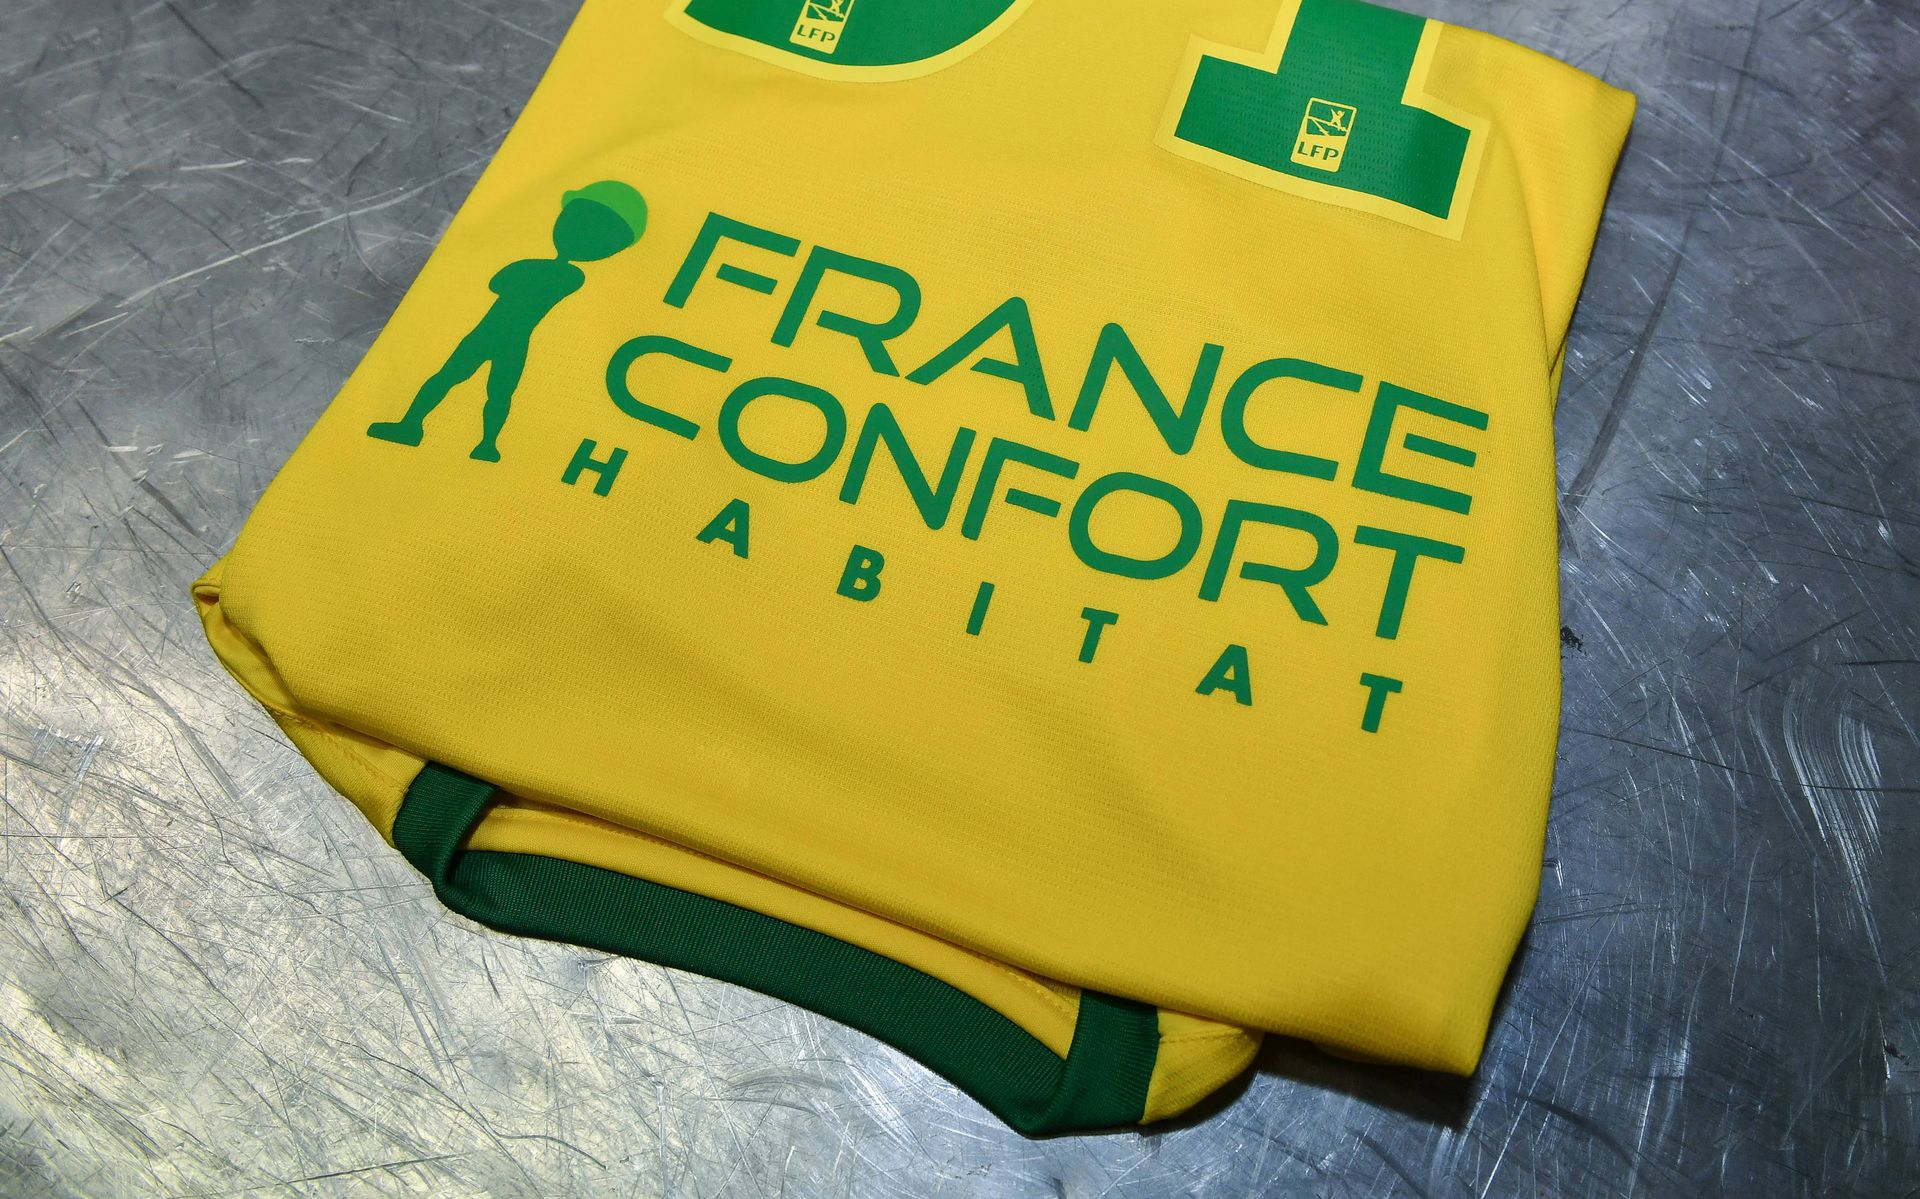 France Confort Habitat SARL plombier